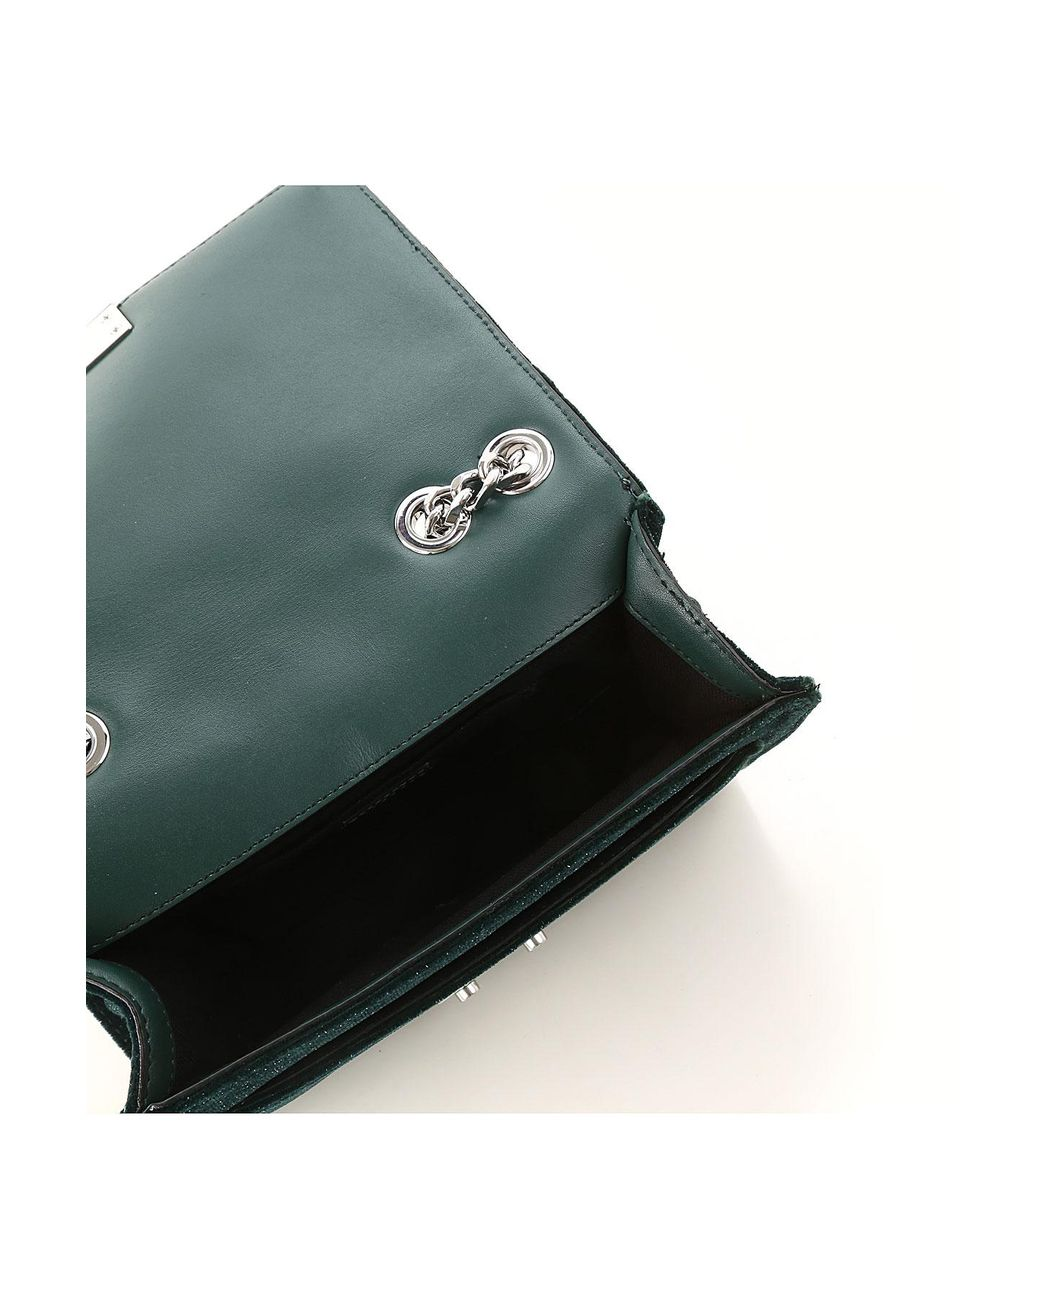 10 un 7mm granos huecos plata esterlina 925-Espaciador Granos electroformación-Chip